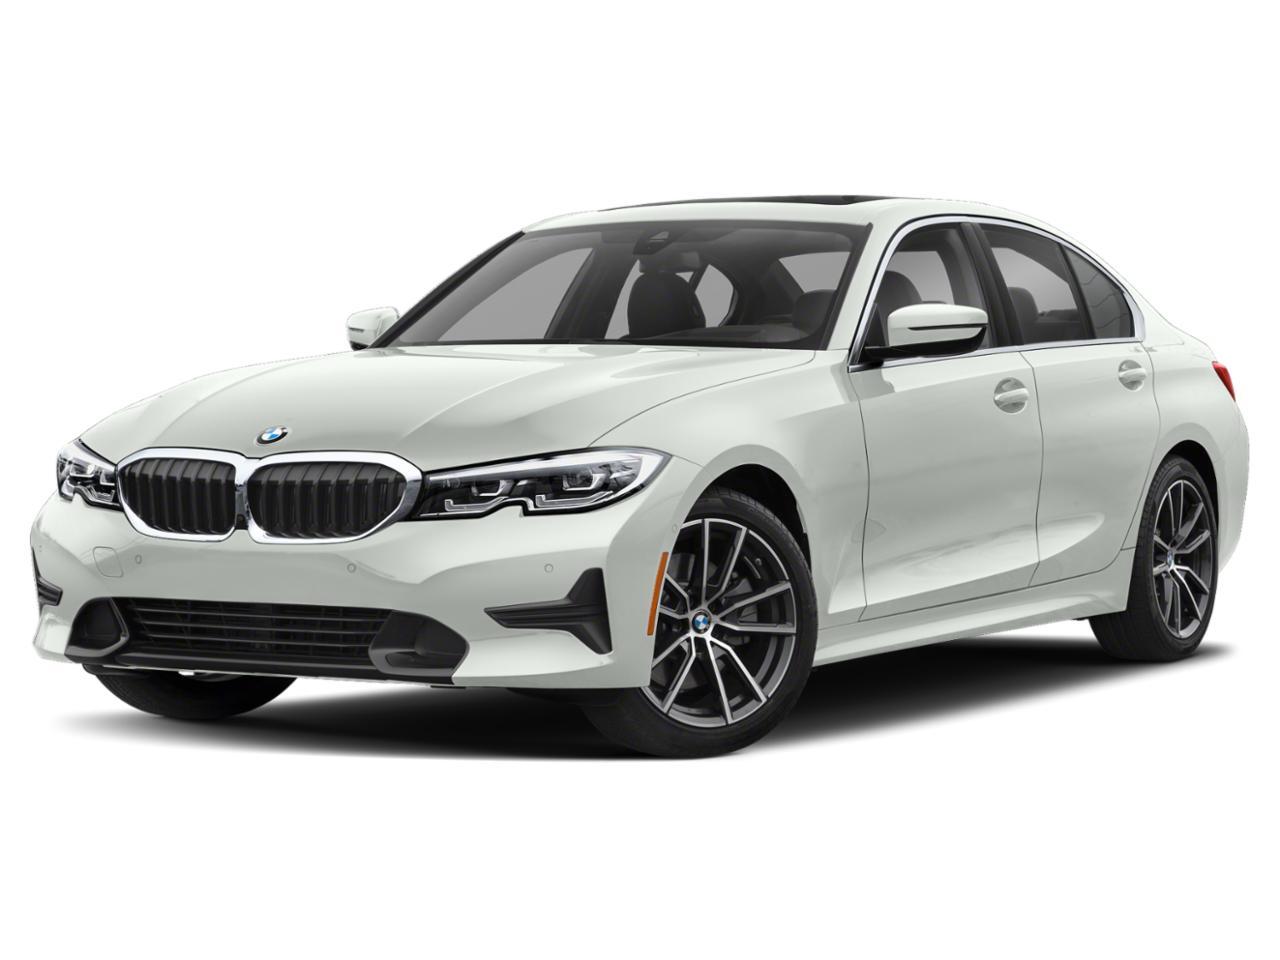 2019 BMW 330i Vehicle Photo in Pleasanton, CA 94588